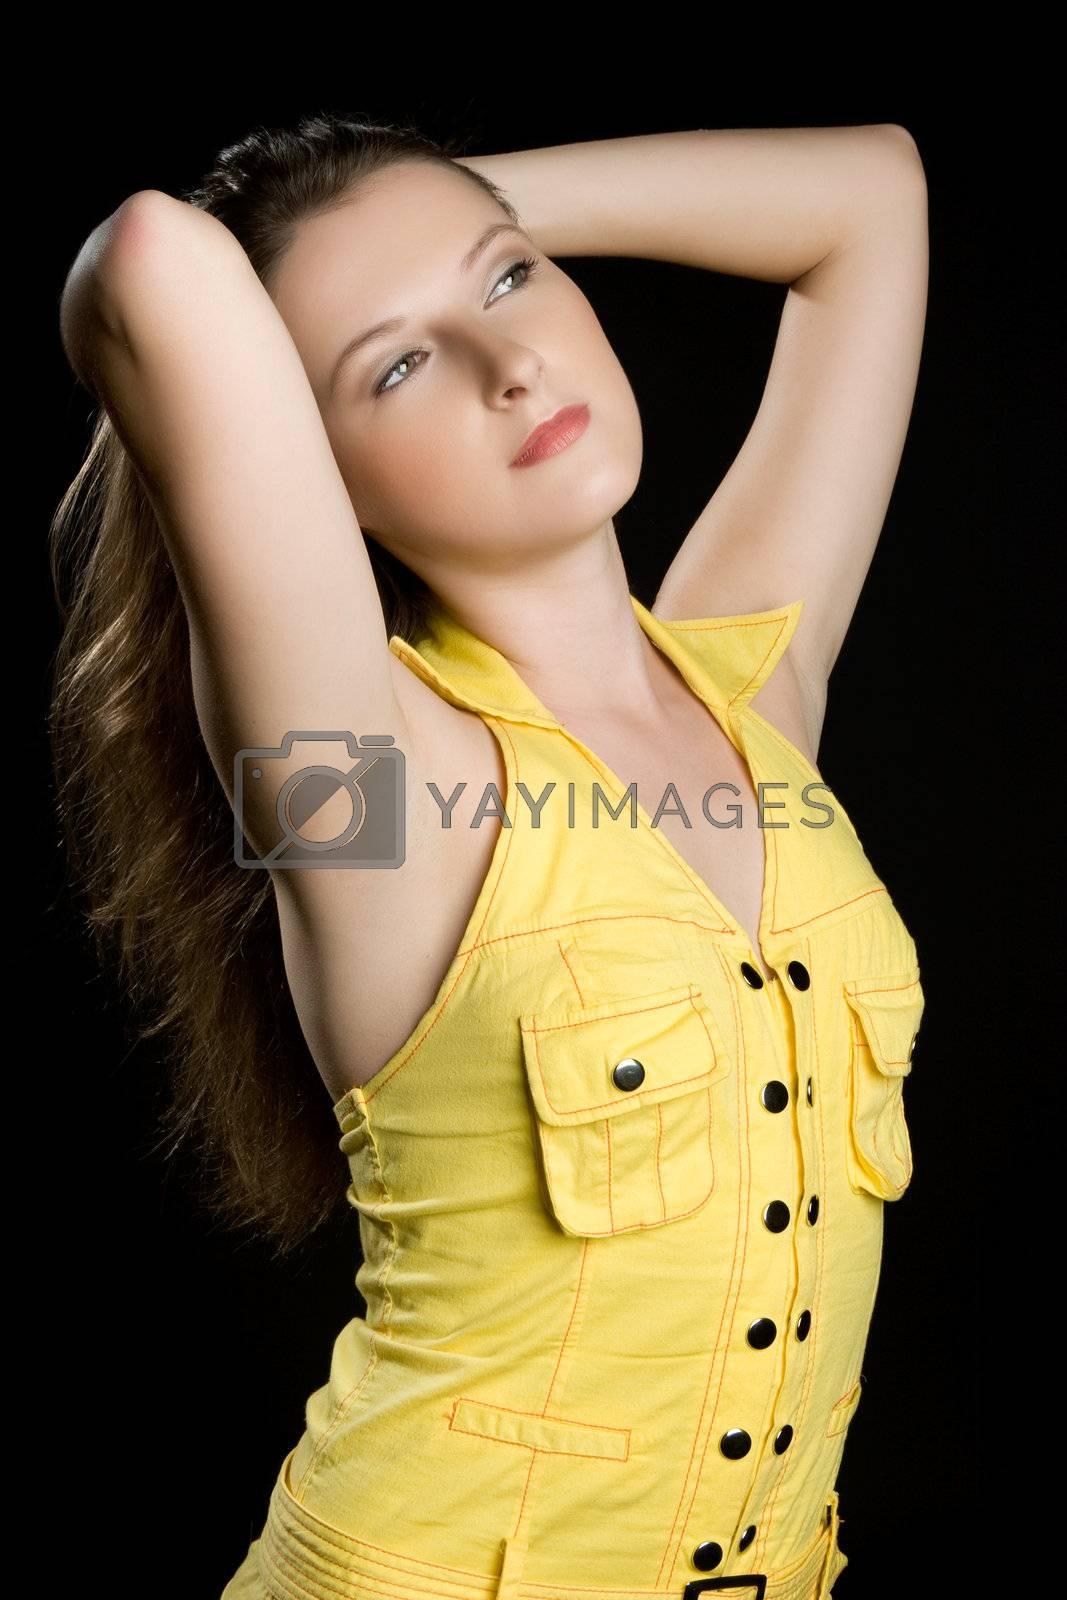 Pretty brunette woman black background